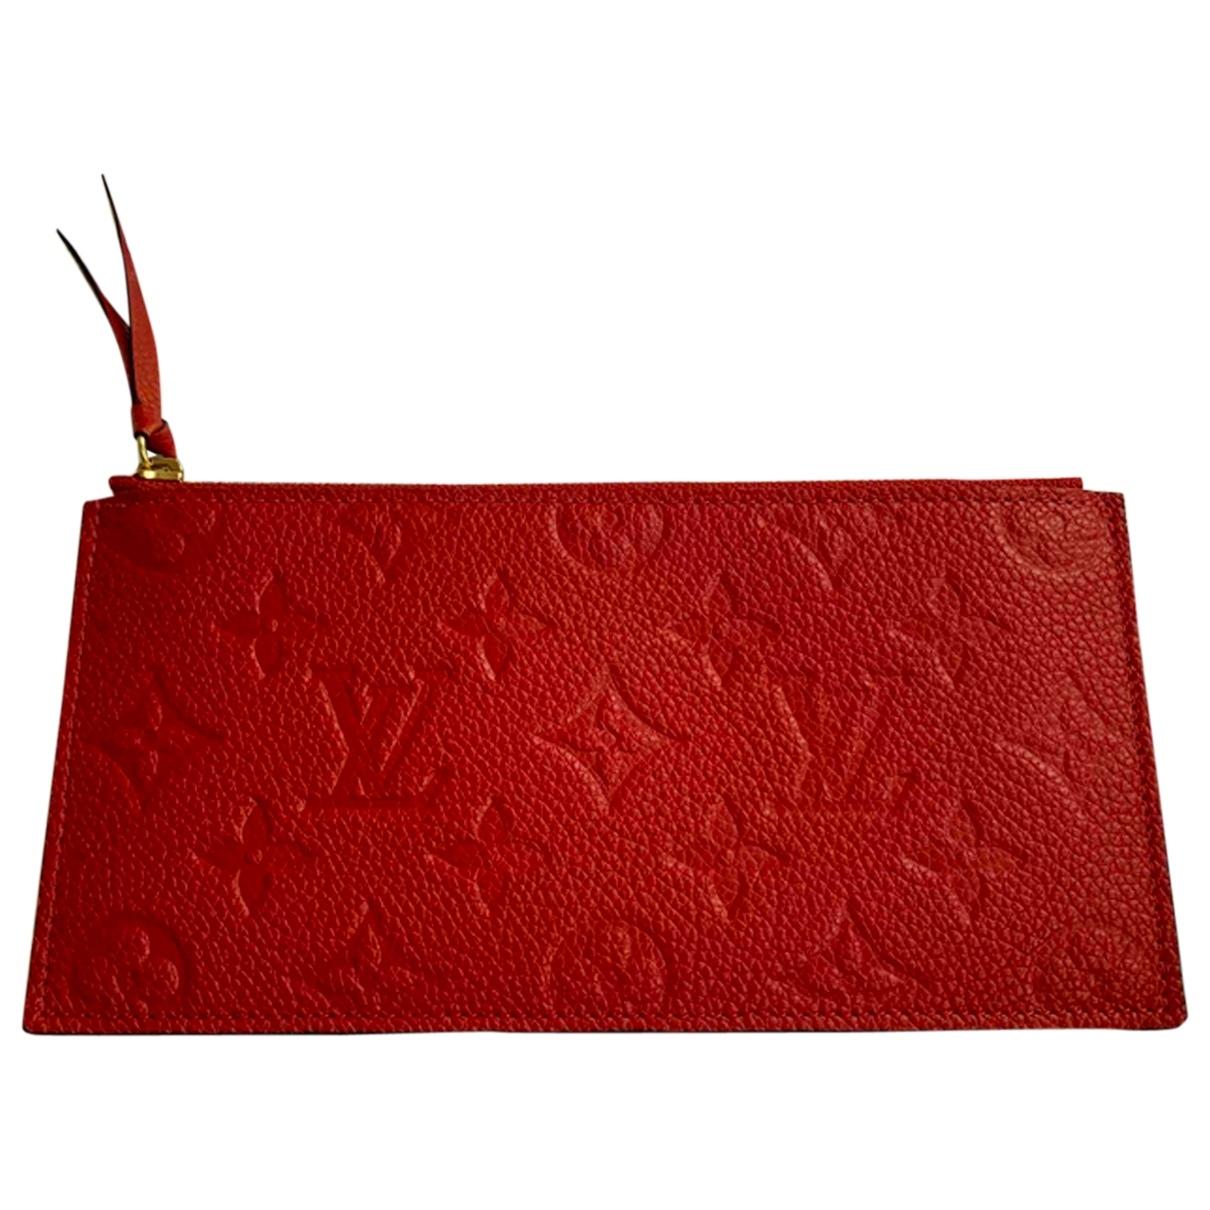 Louis Vuitton Adèle Red Leather Purses, wallet & cases for Women \N